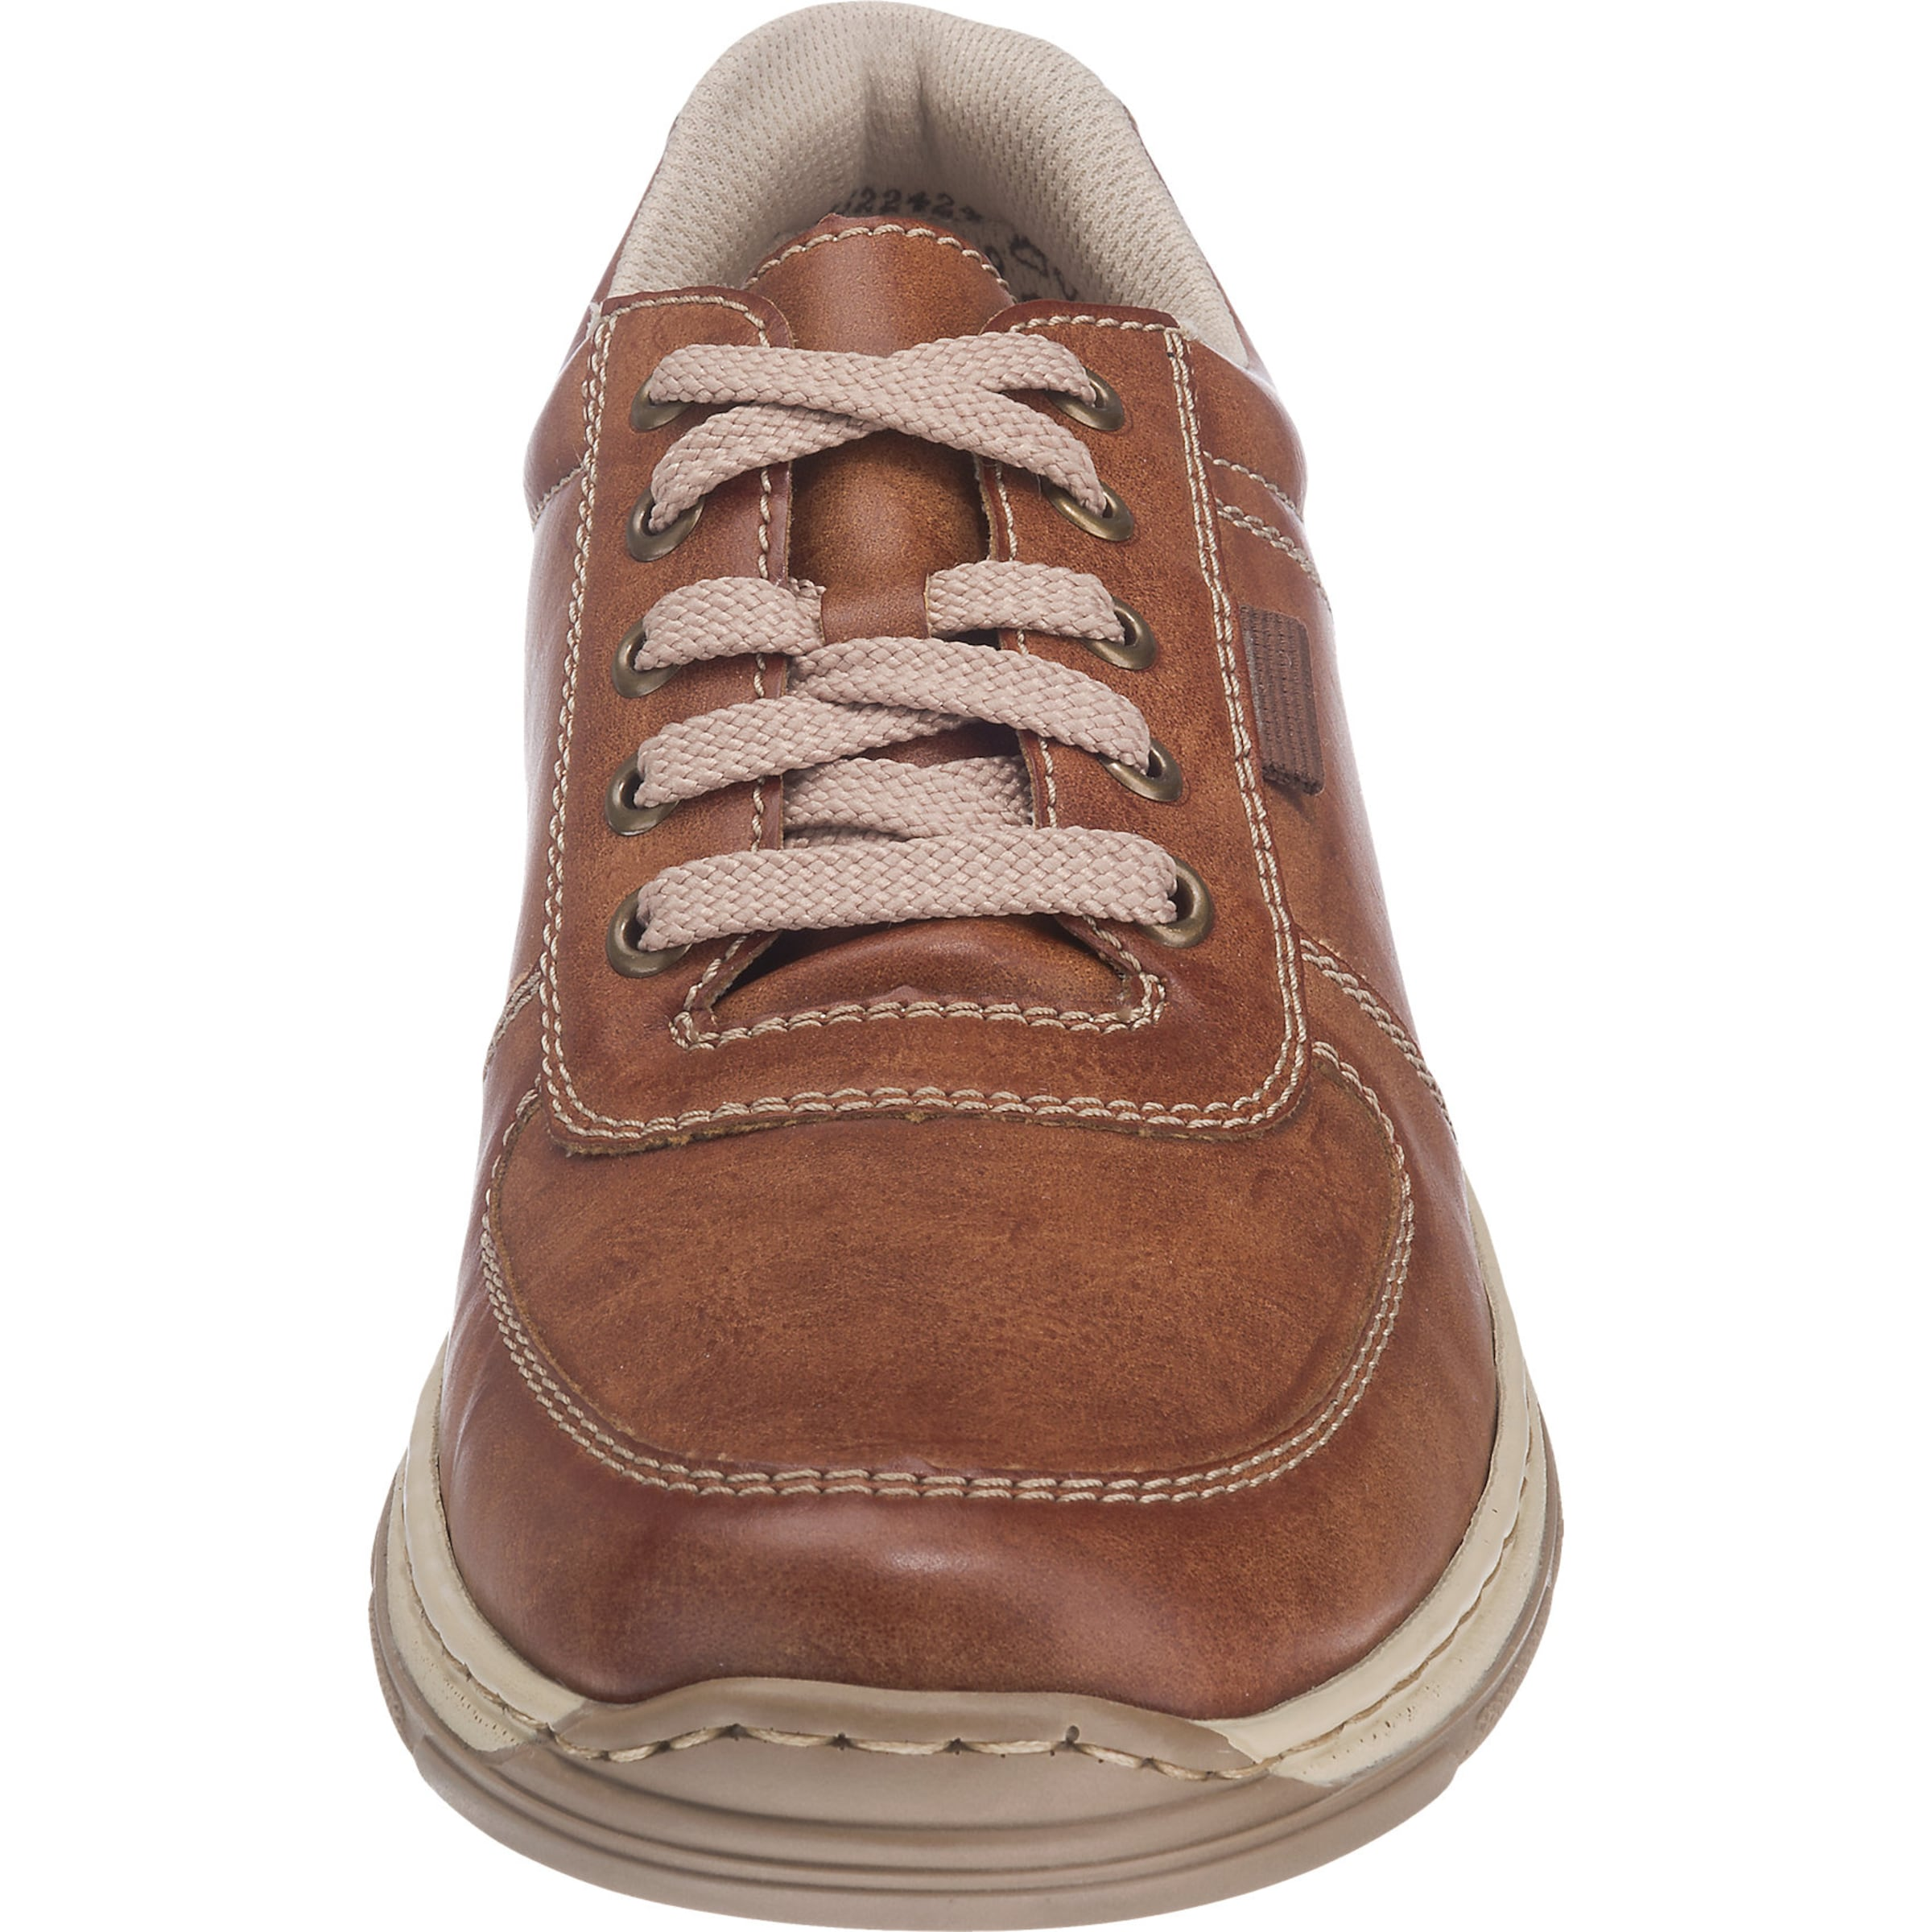 Rieker Rieker In Schuhe Schuhe Braun Rieker In Rieker In Schuhe Schuhe Braun Braun Klc13JTF